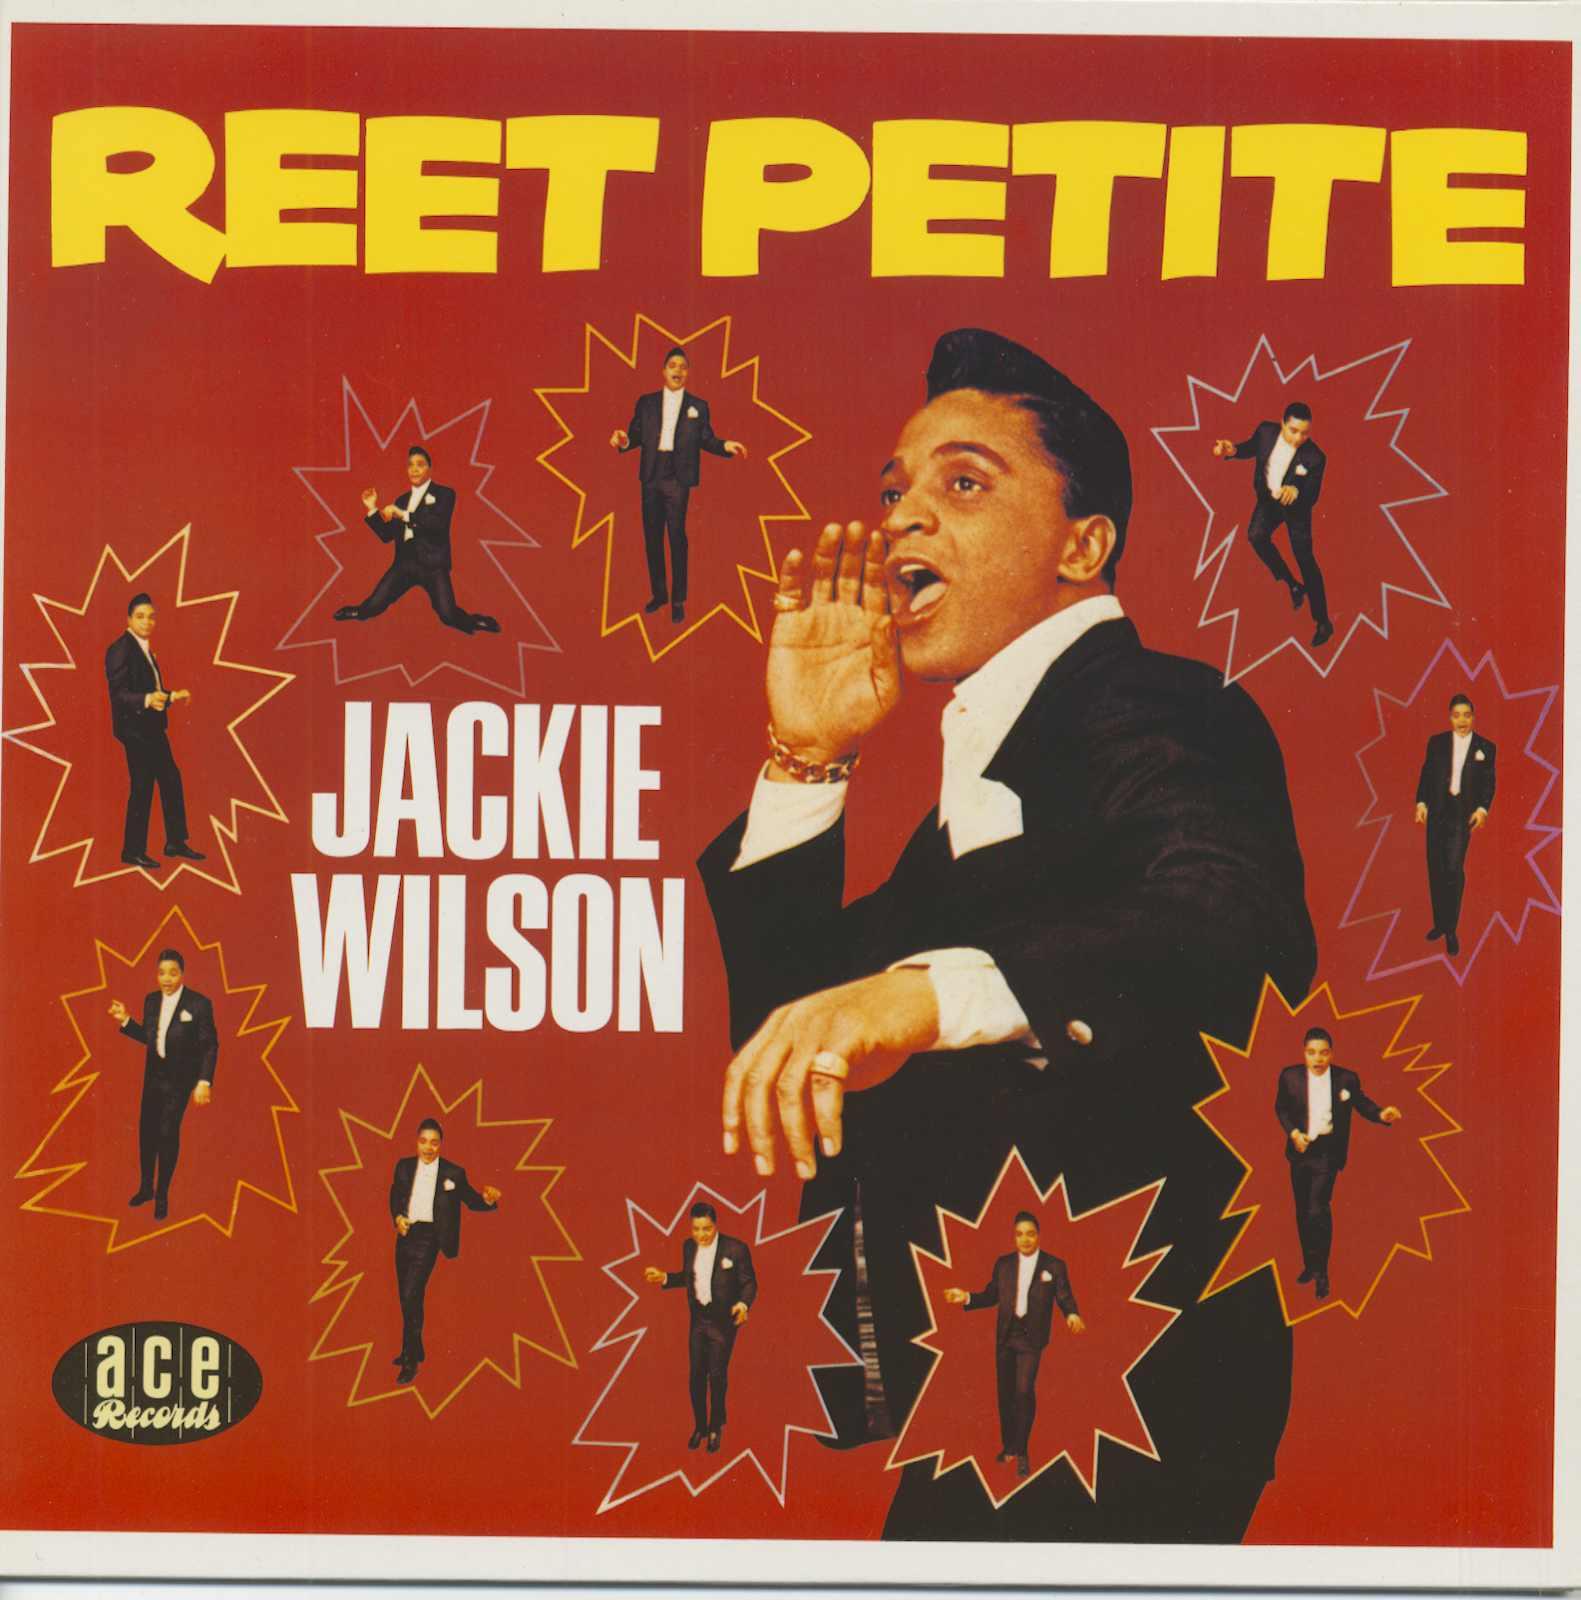 Jackie Wilson LP: Reet Petite (LP) - Bear Family Records